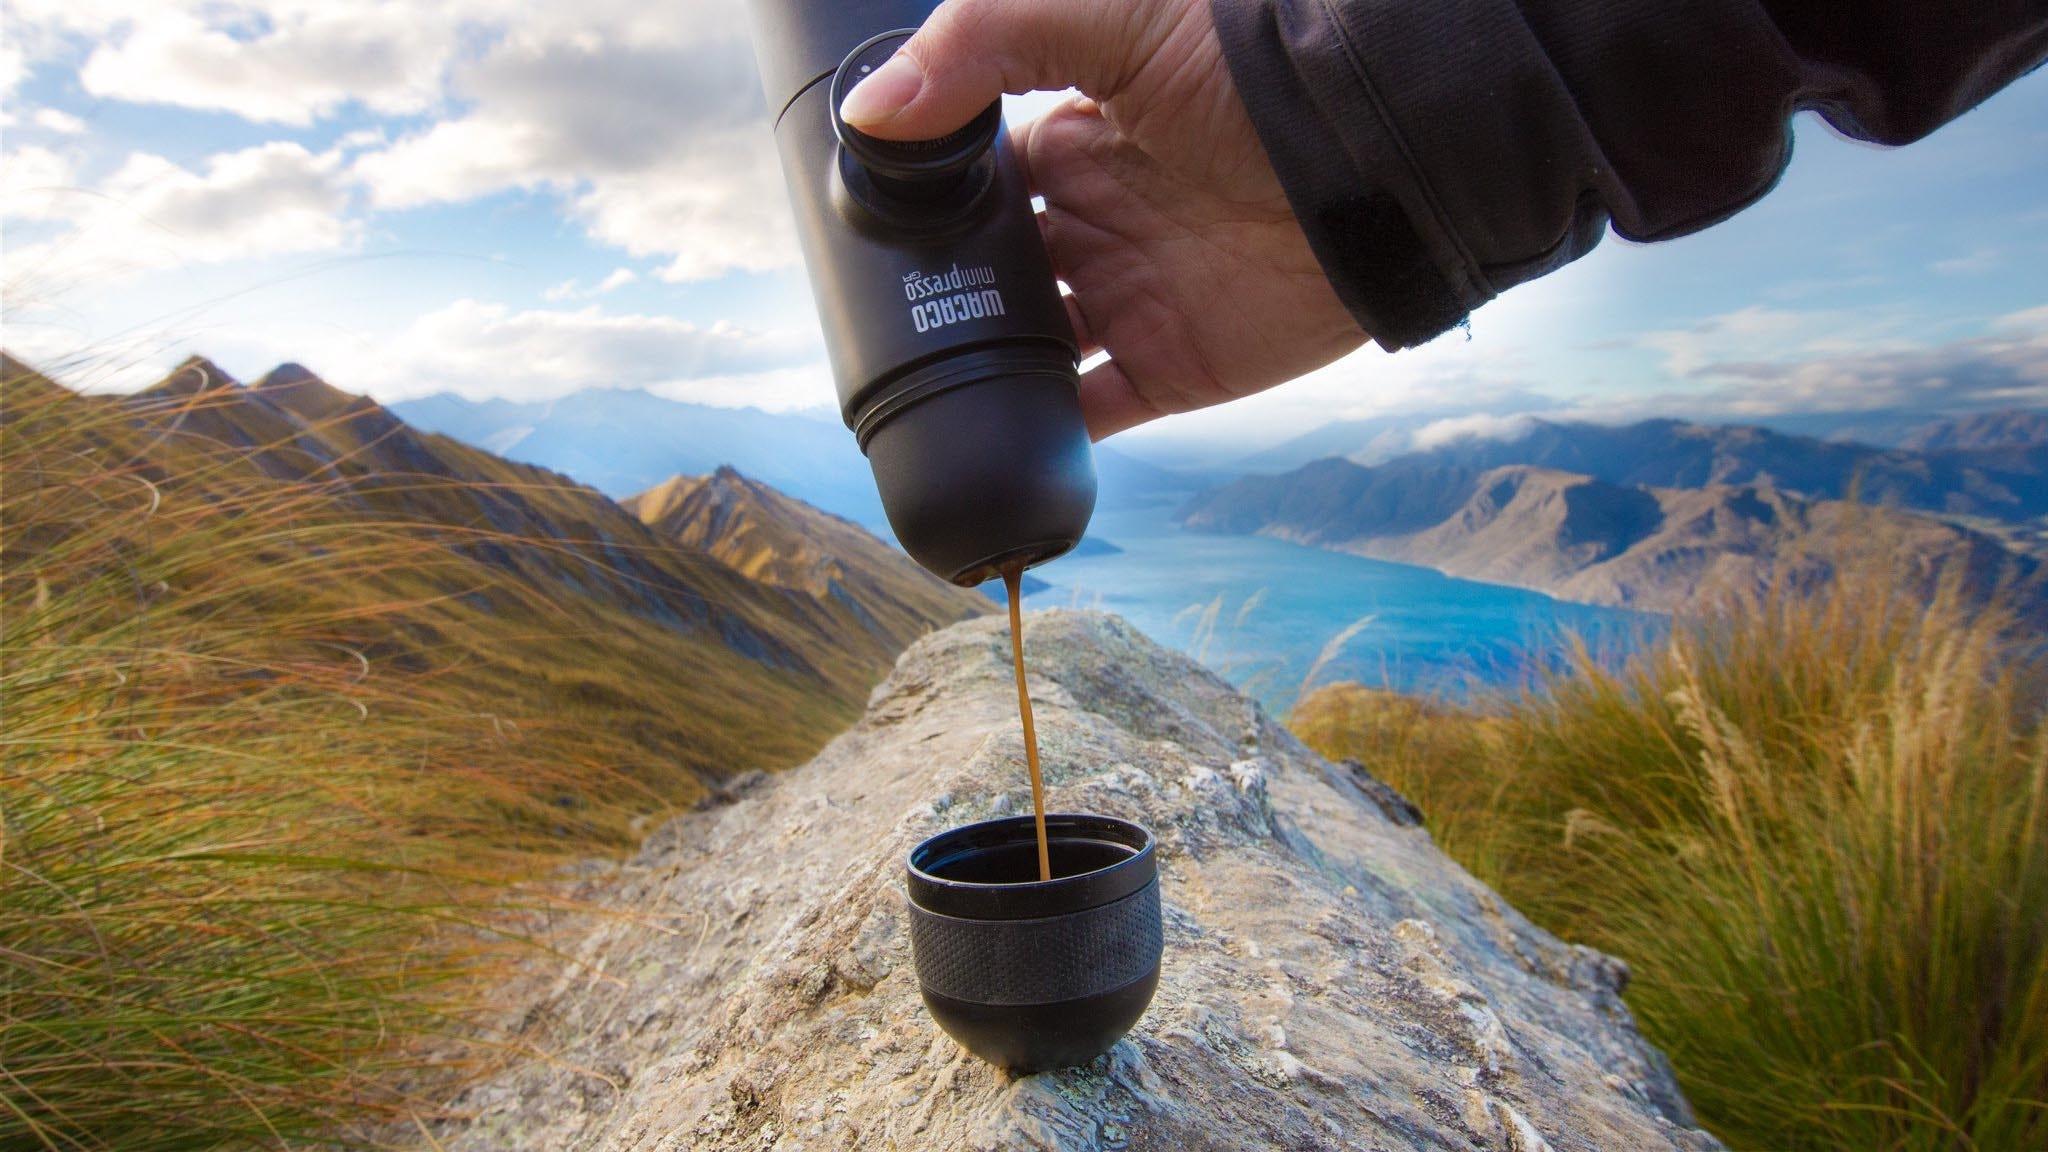 person making espresso coffee on a mountain with wacaco portable espresso maker